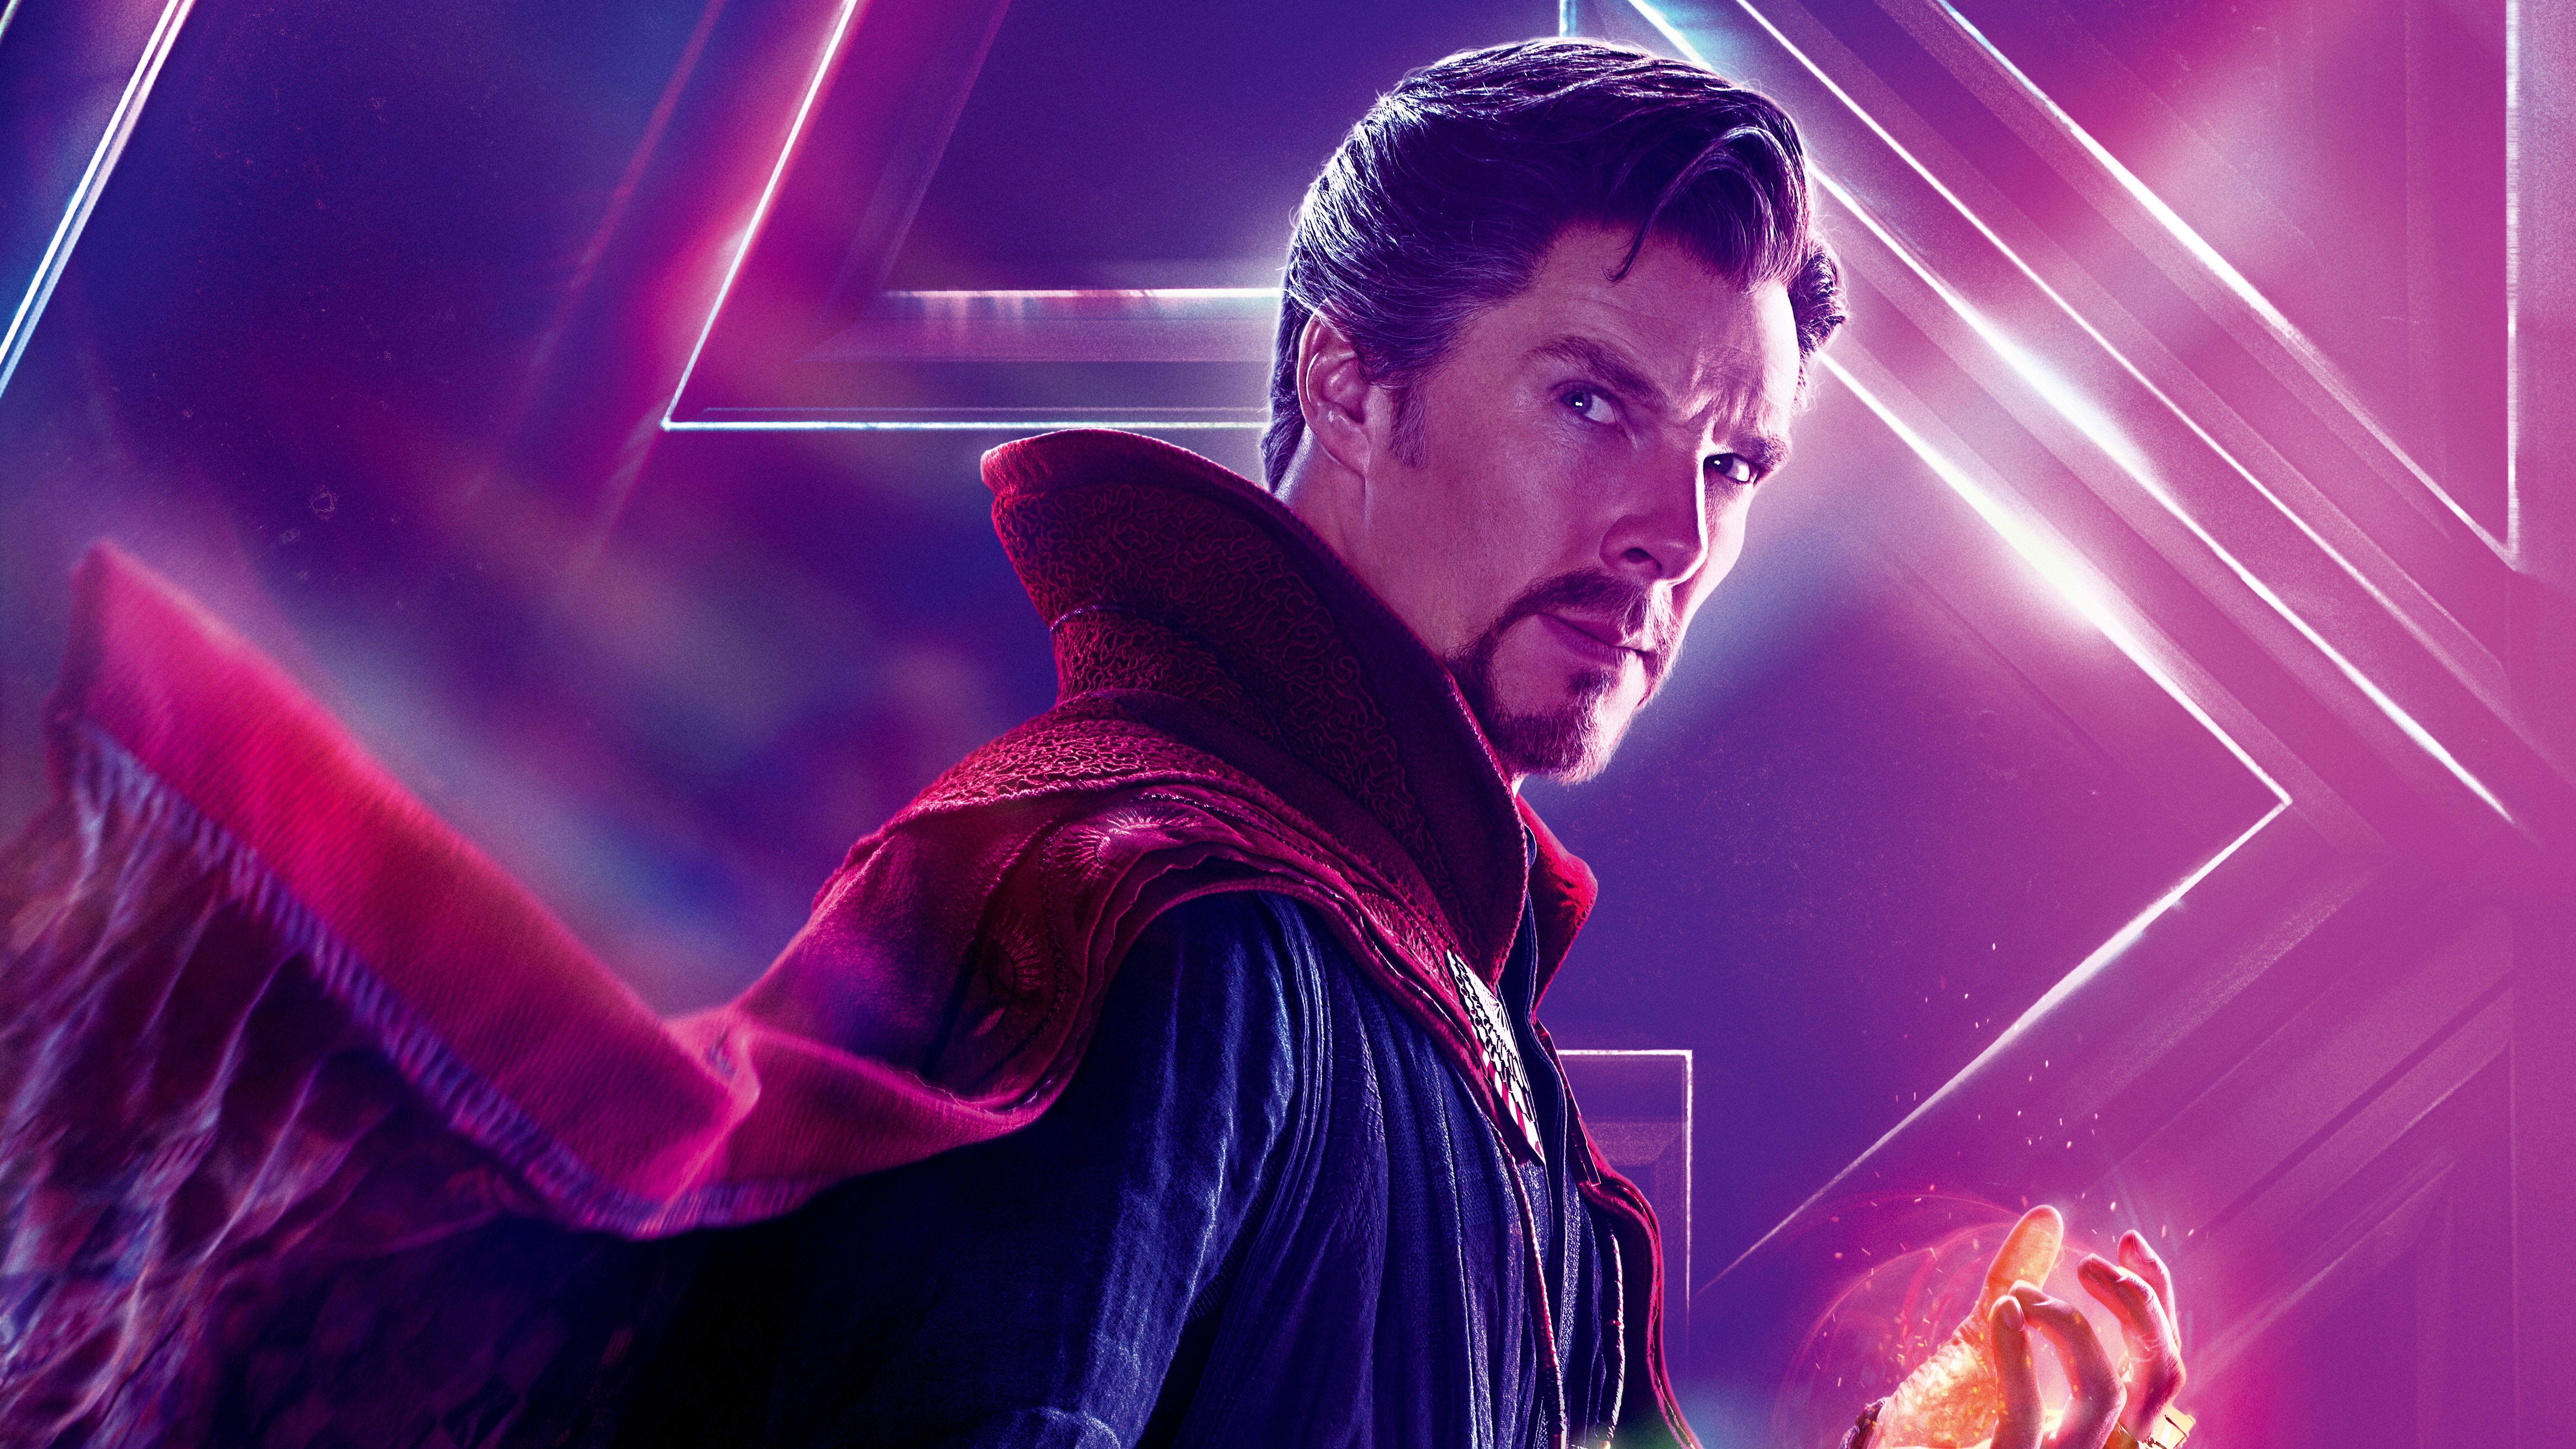 Shuri In Avengers Infinity War New Poster Hd Movies 4k: Doctor Strange In Avengers Infinity War 8k Poster, HD